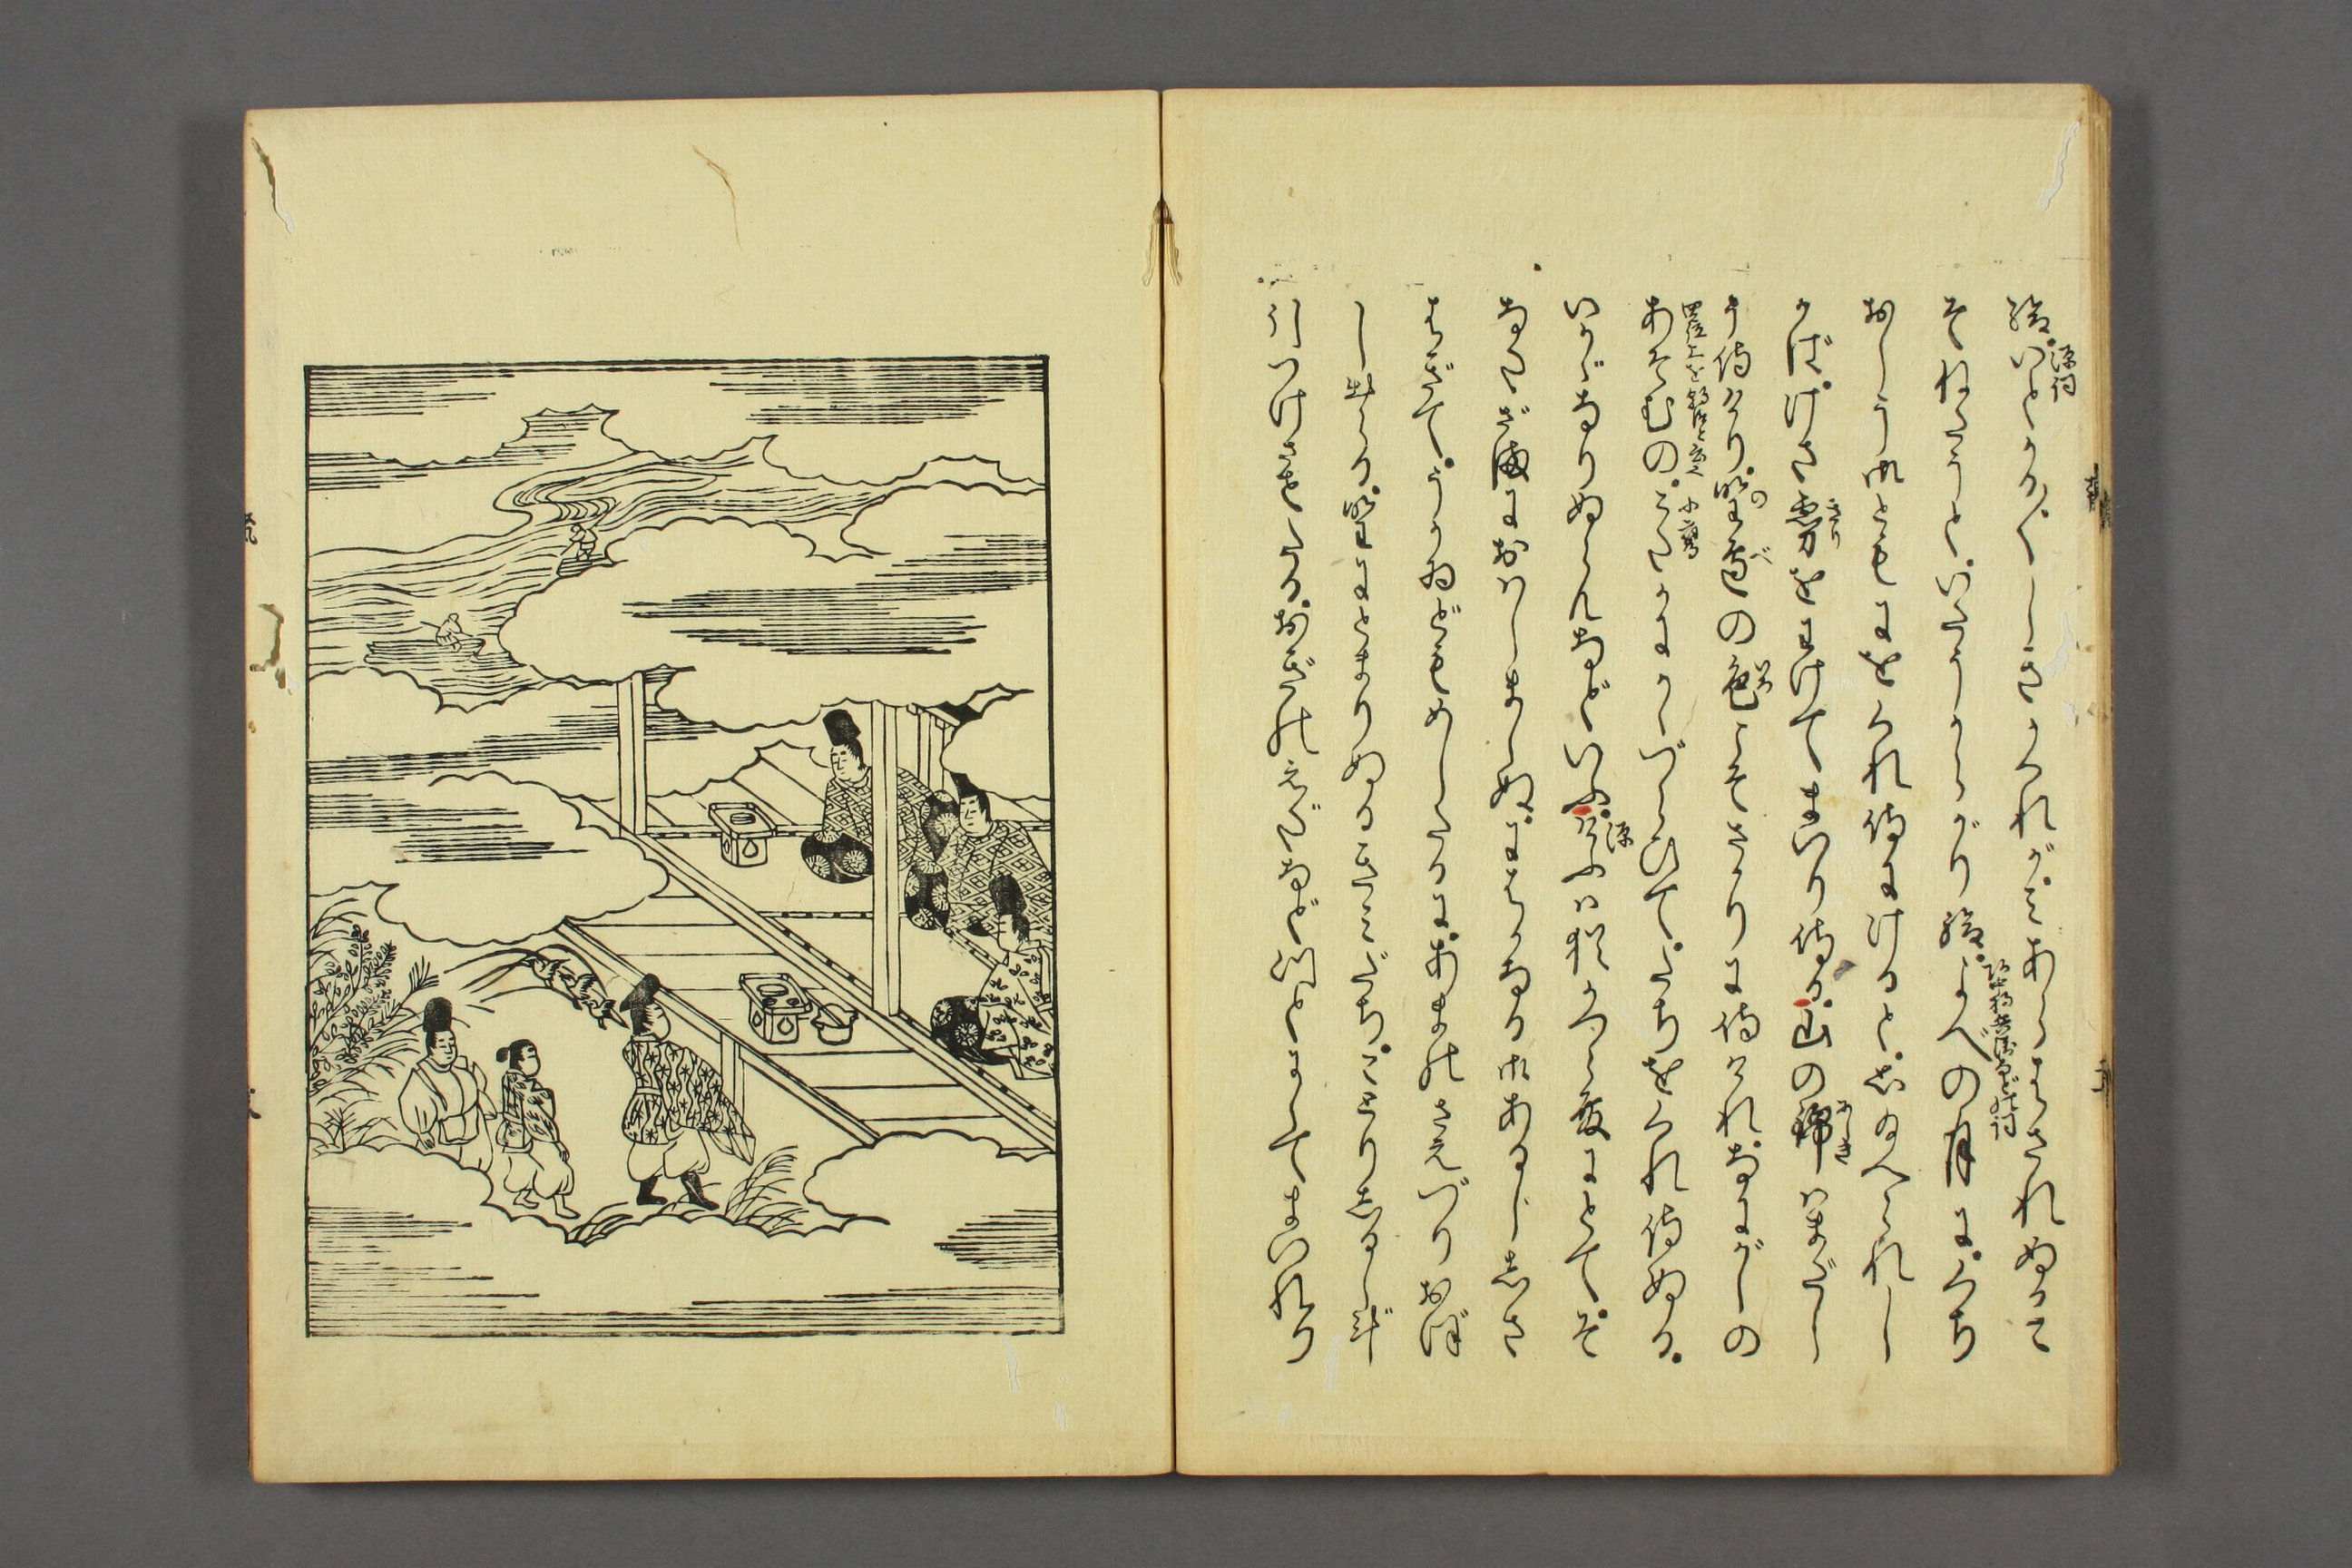 http://archive.wul.waseda.ac.jp/kosho/bunko30/bunko30_a0007/bunko30_a0007_0018/bunko30_a0007_0018_p0019.jpg